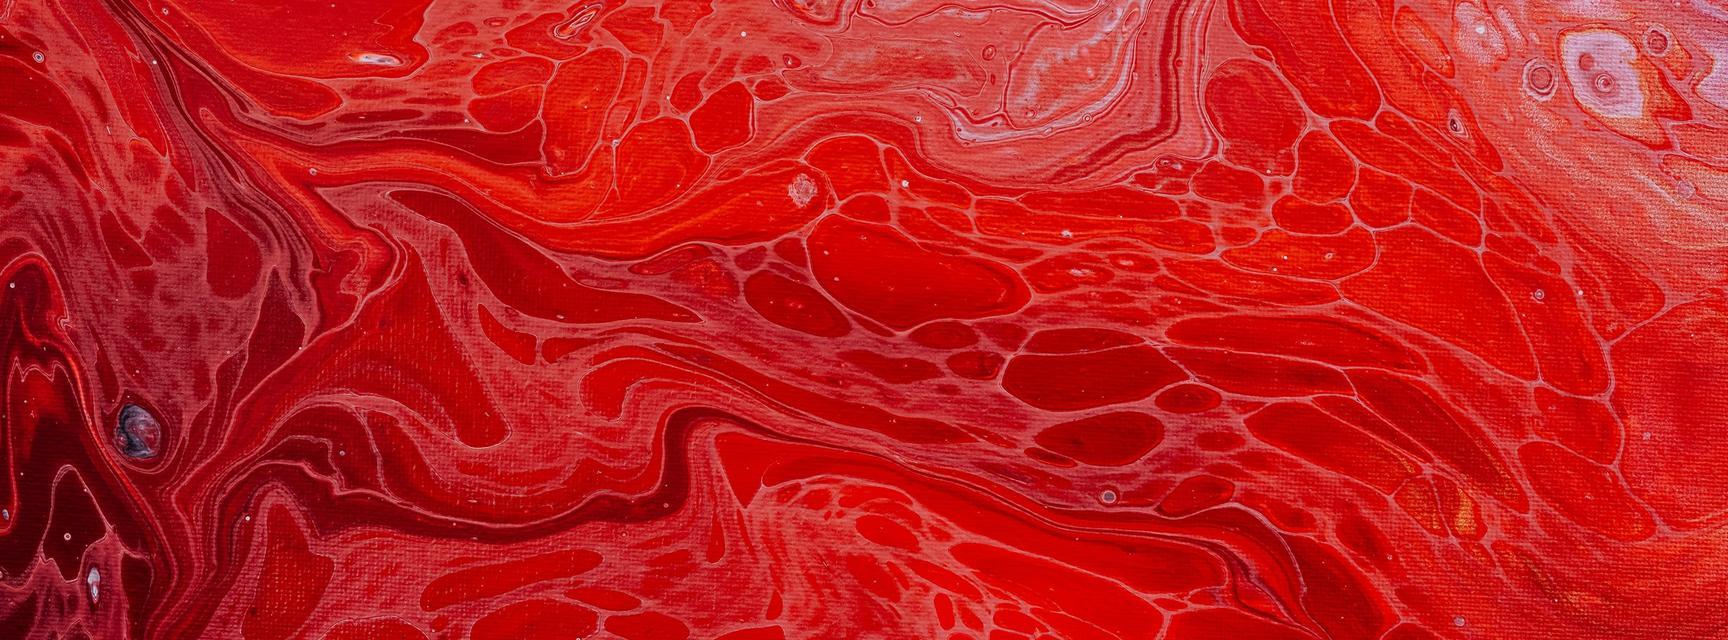 Pattern of swirling red oil